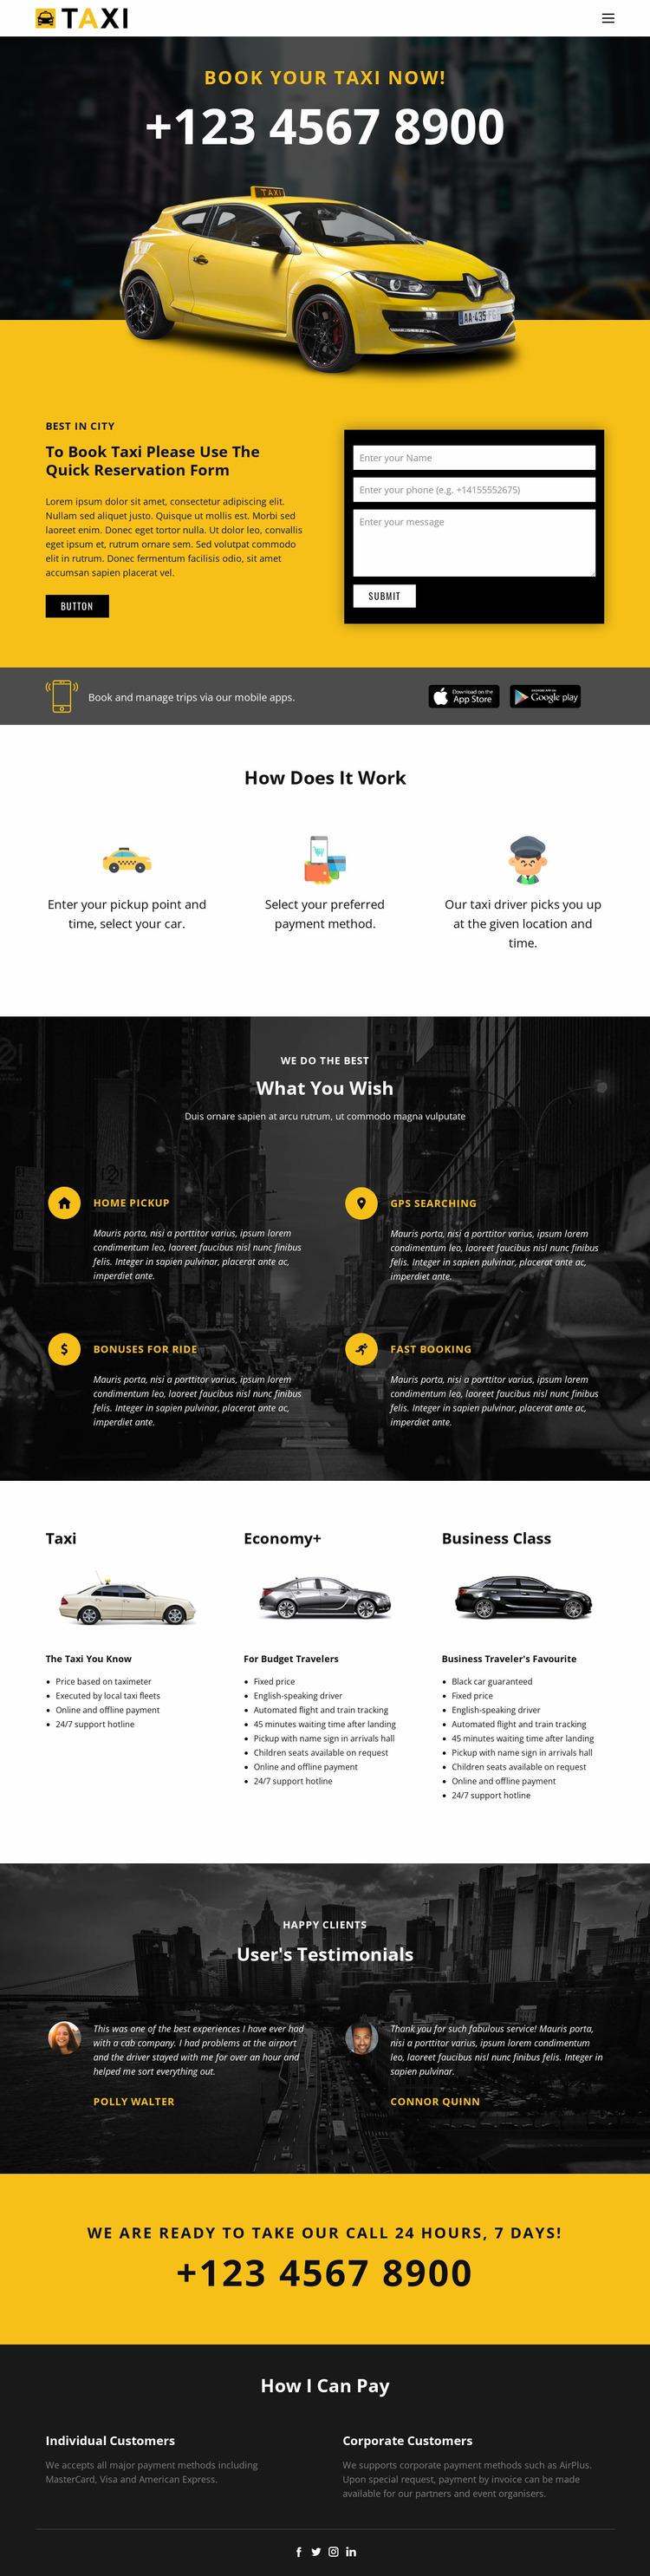 Fastest taxi cars Website Mockup